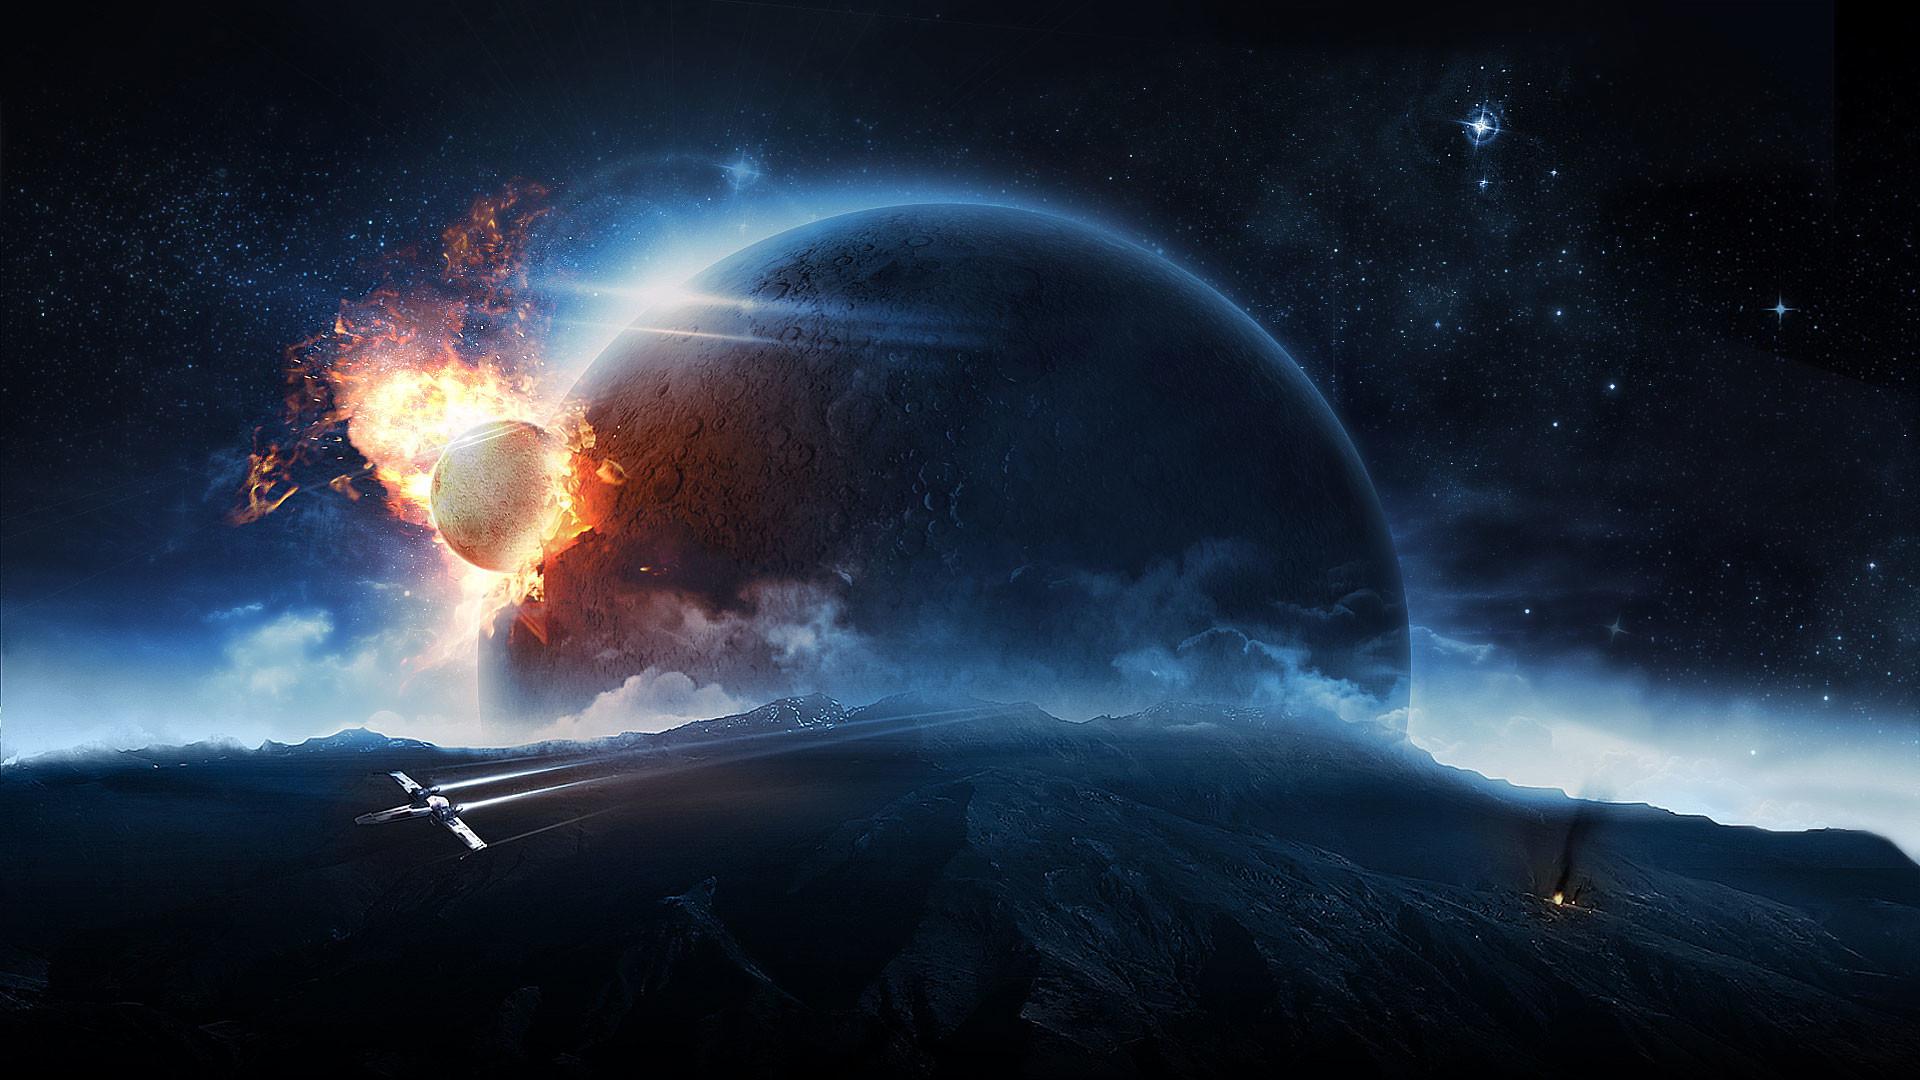 High Resolution Space Wallpaper